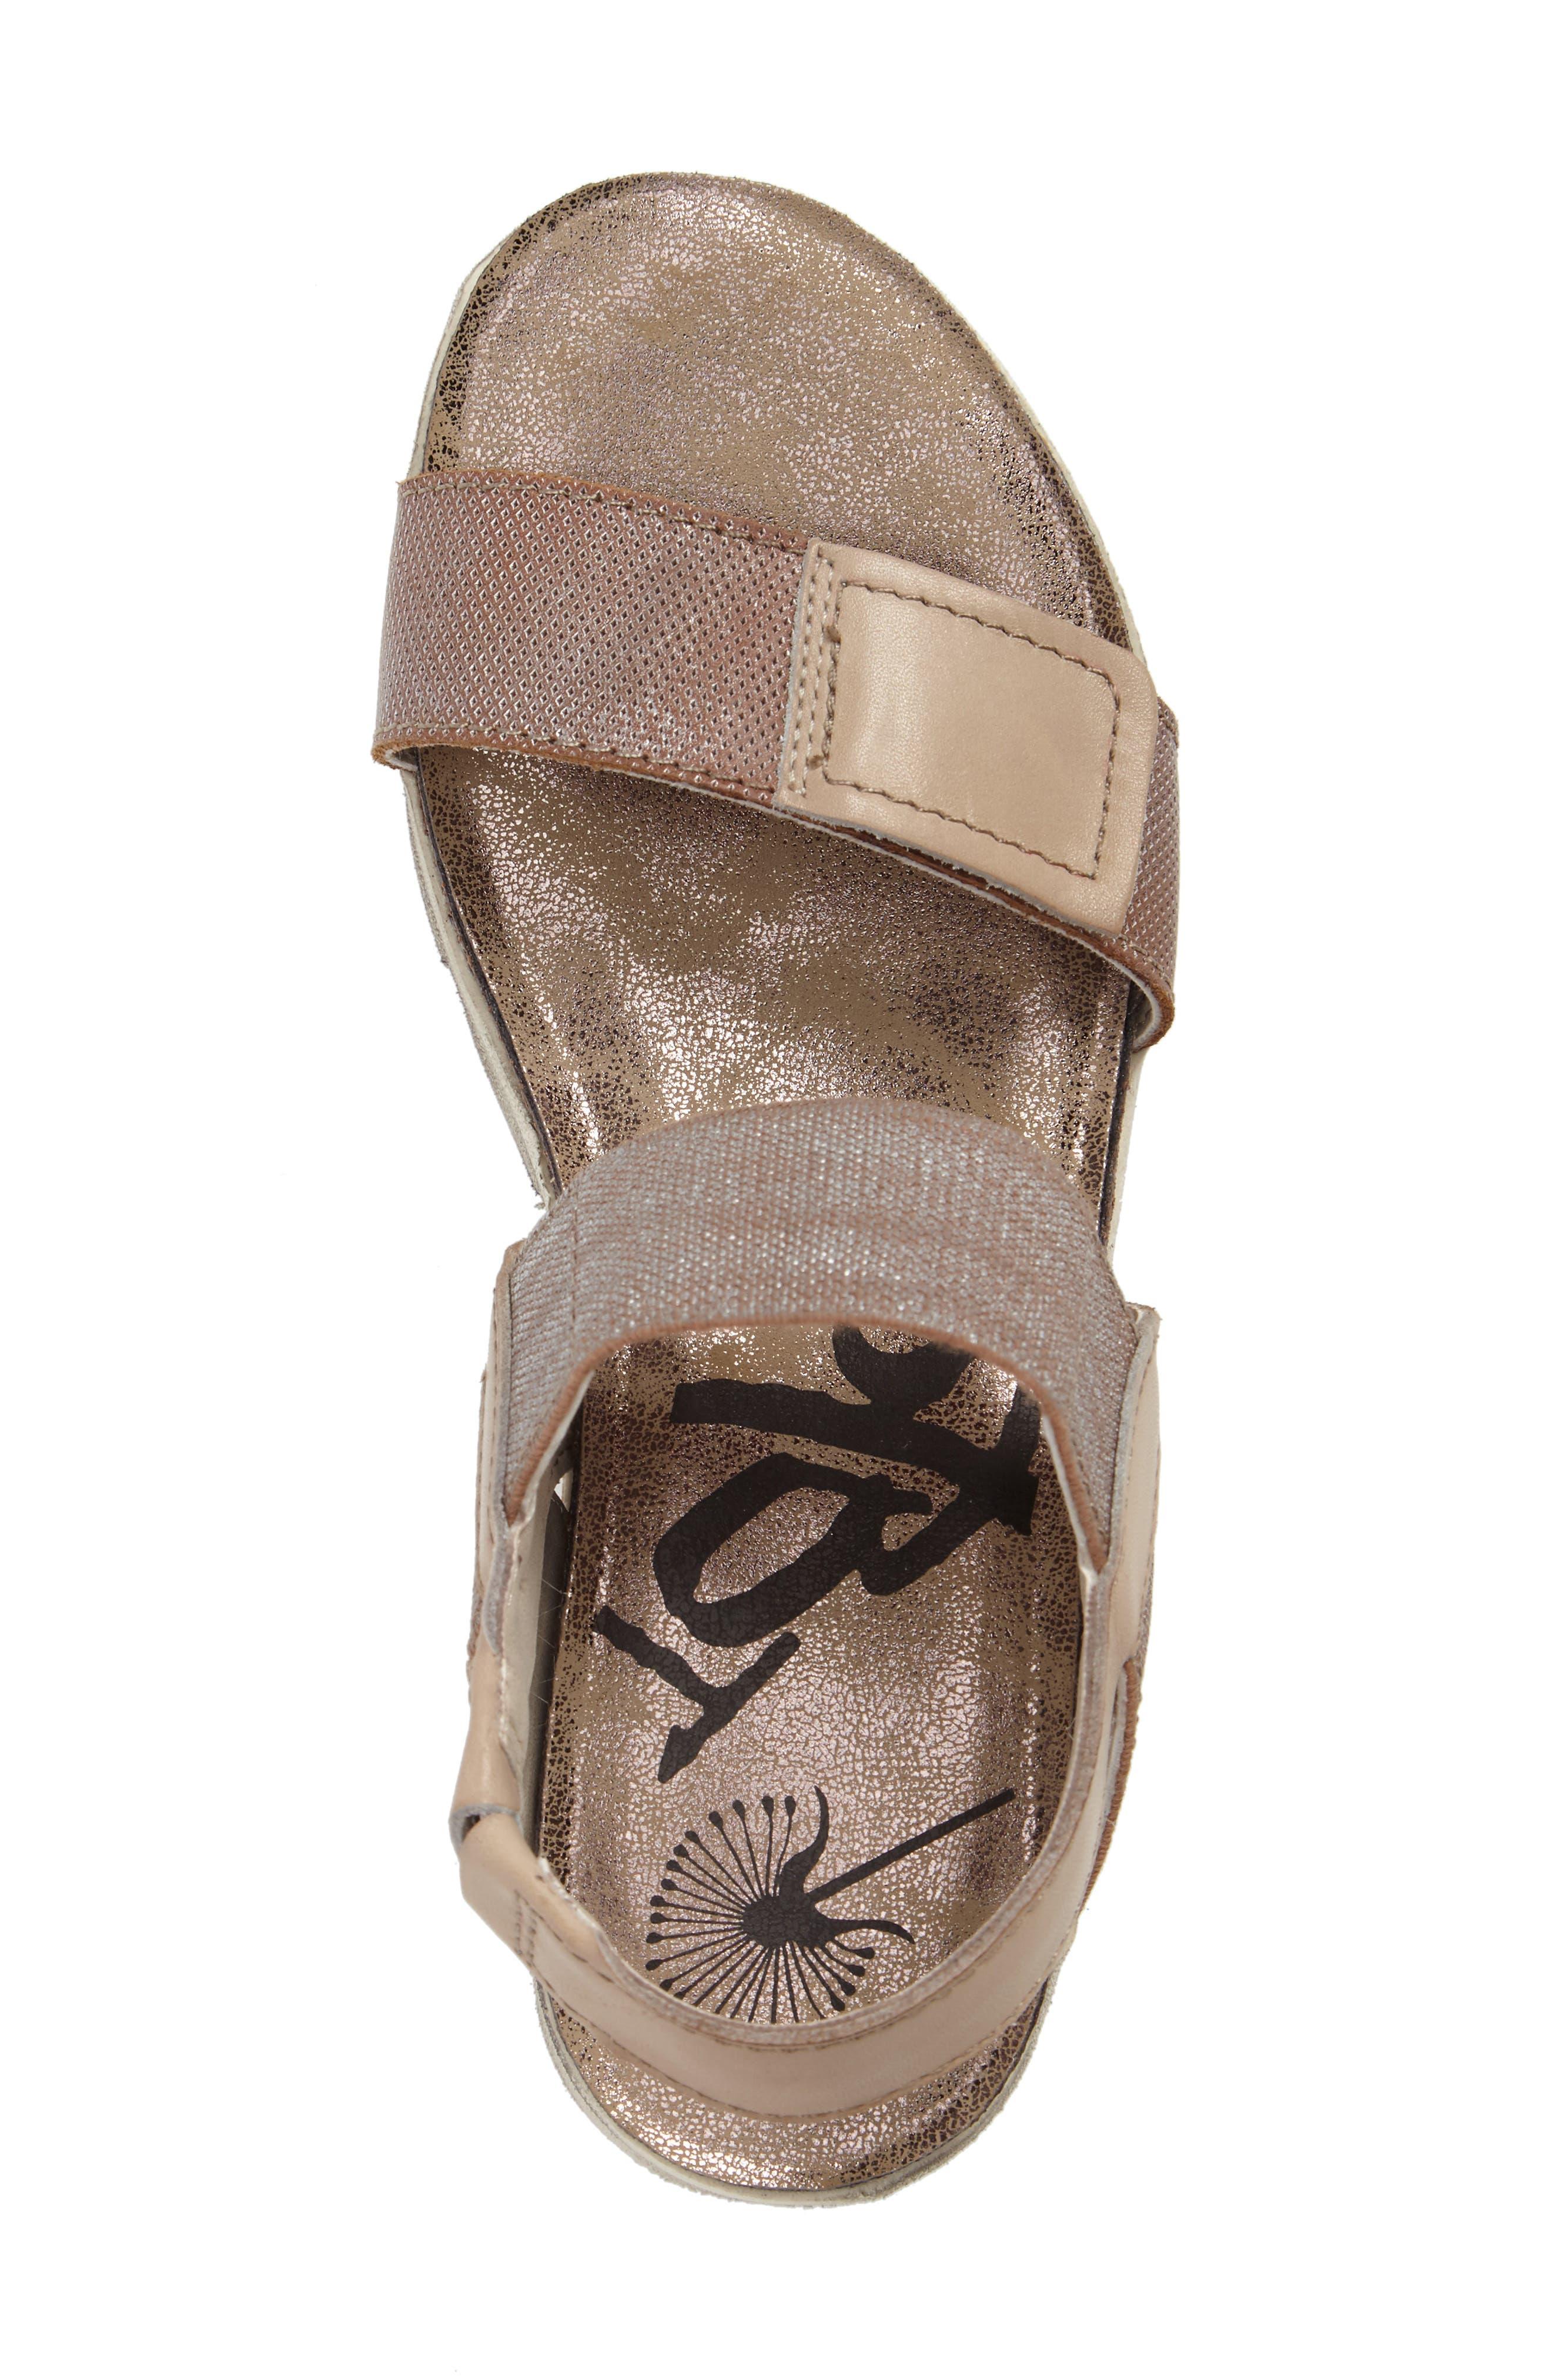 Nova Platform Sandal,                             Alternate thumbnail 5, color,                             SILVER LEATHER